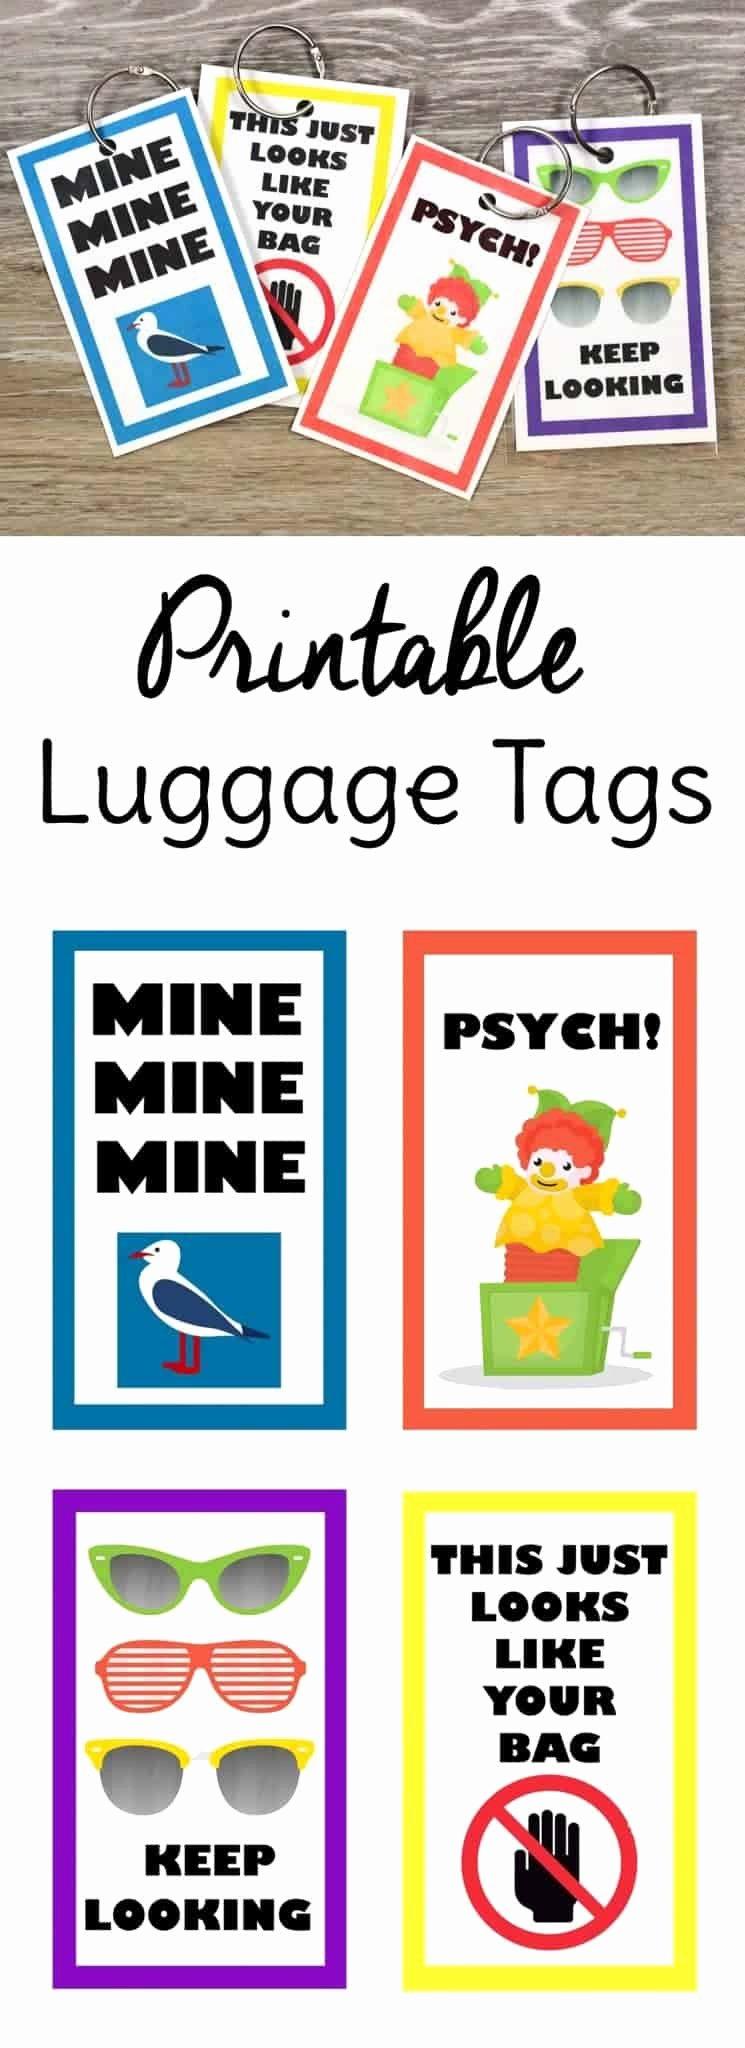 Luggage Tag Template Free Printable Elegant Funny Free Printable Luggage Tags